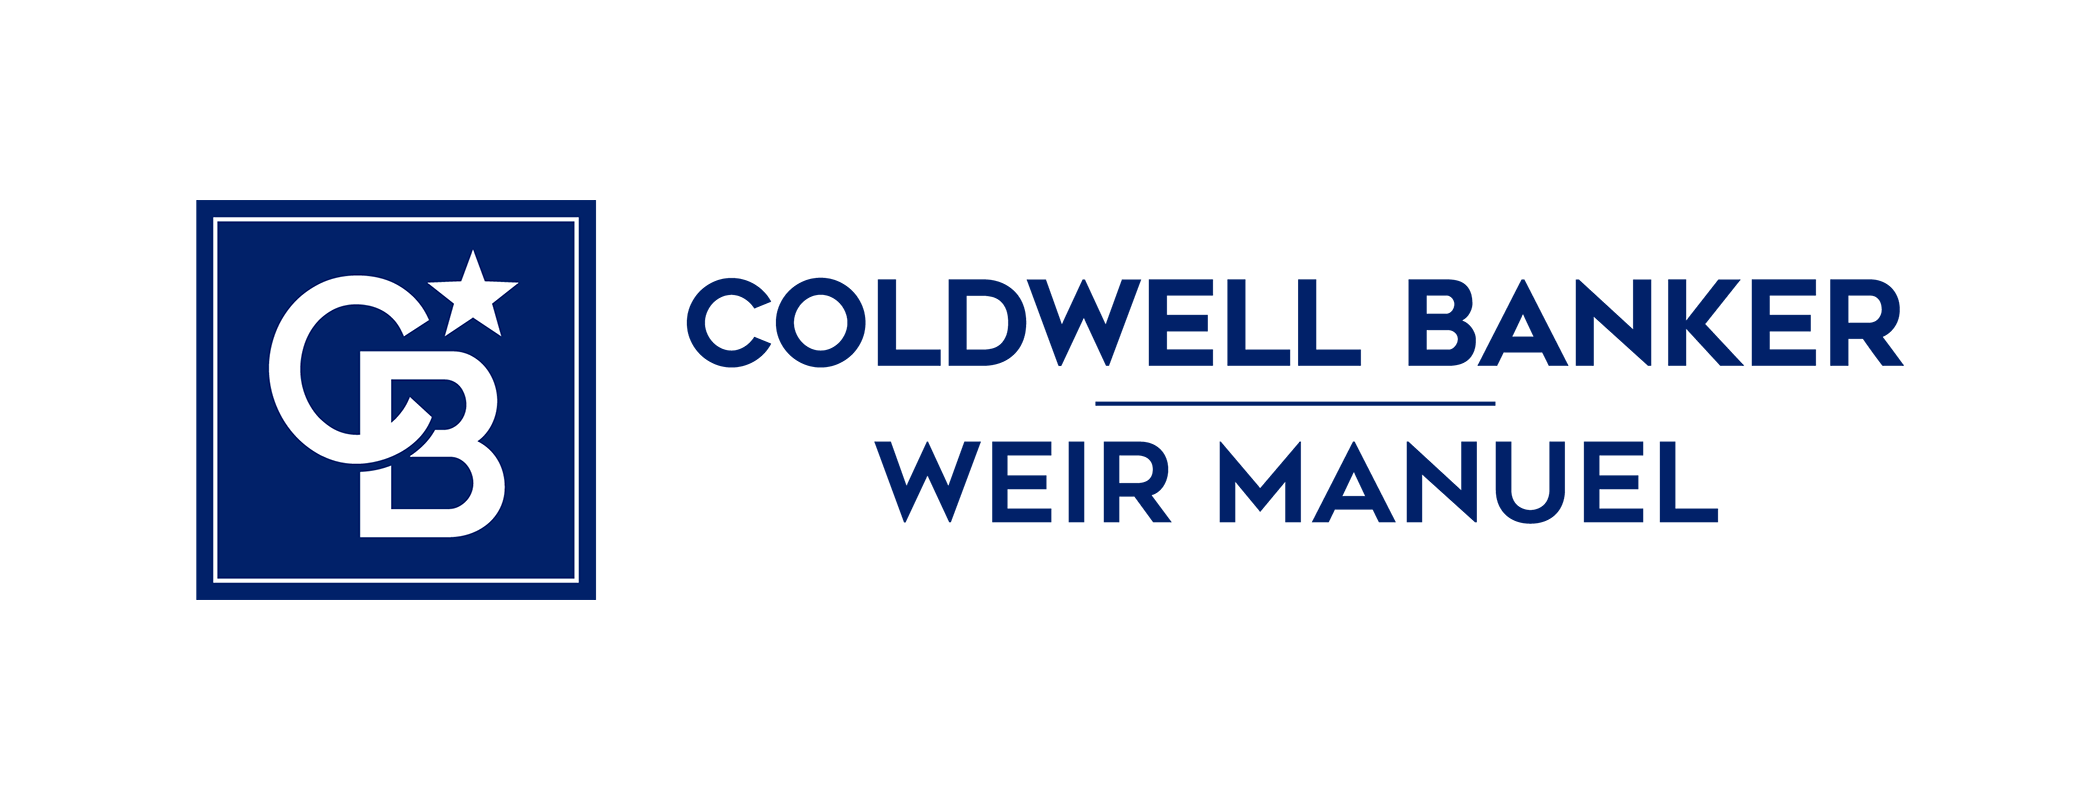 Derek Talifer - Coldwell Banker Weir Manuel Logo